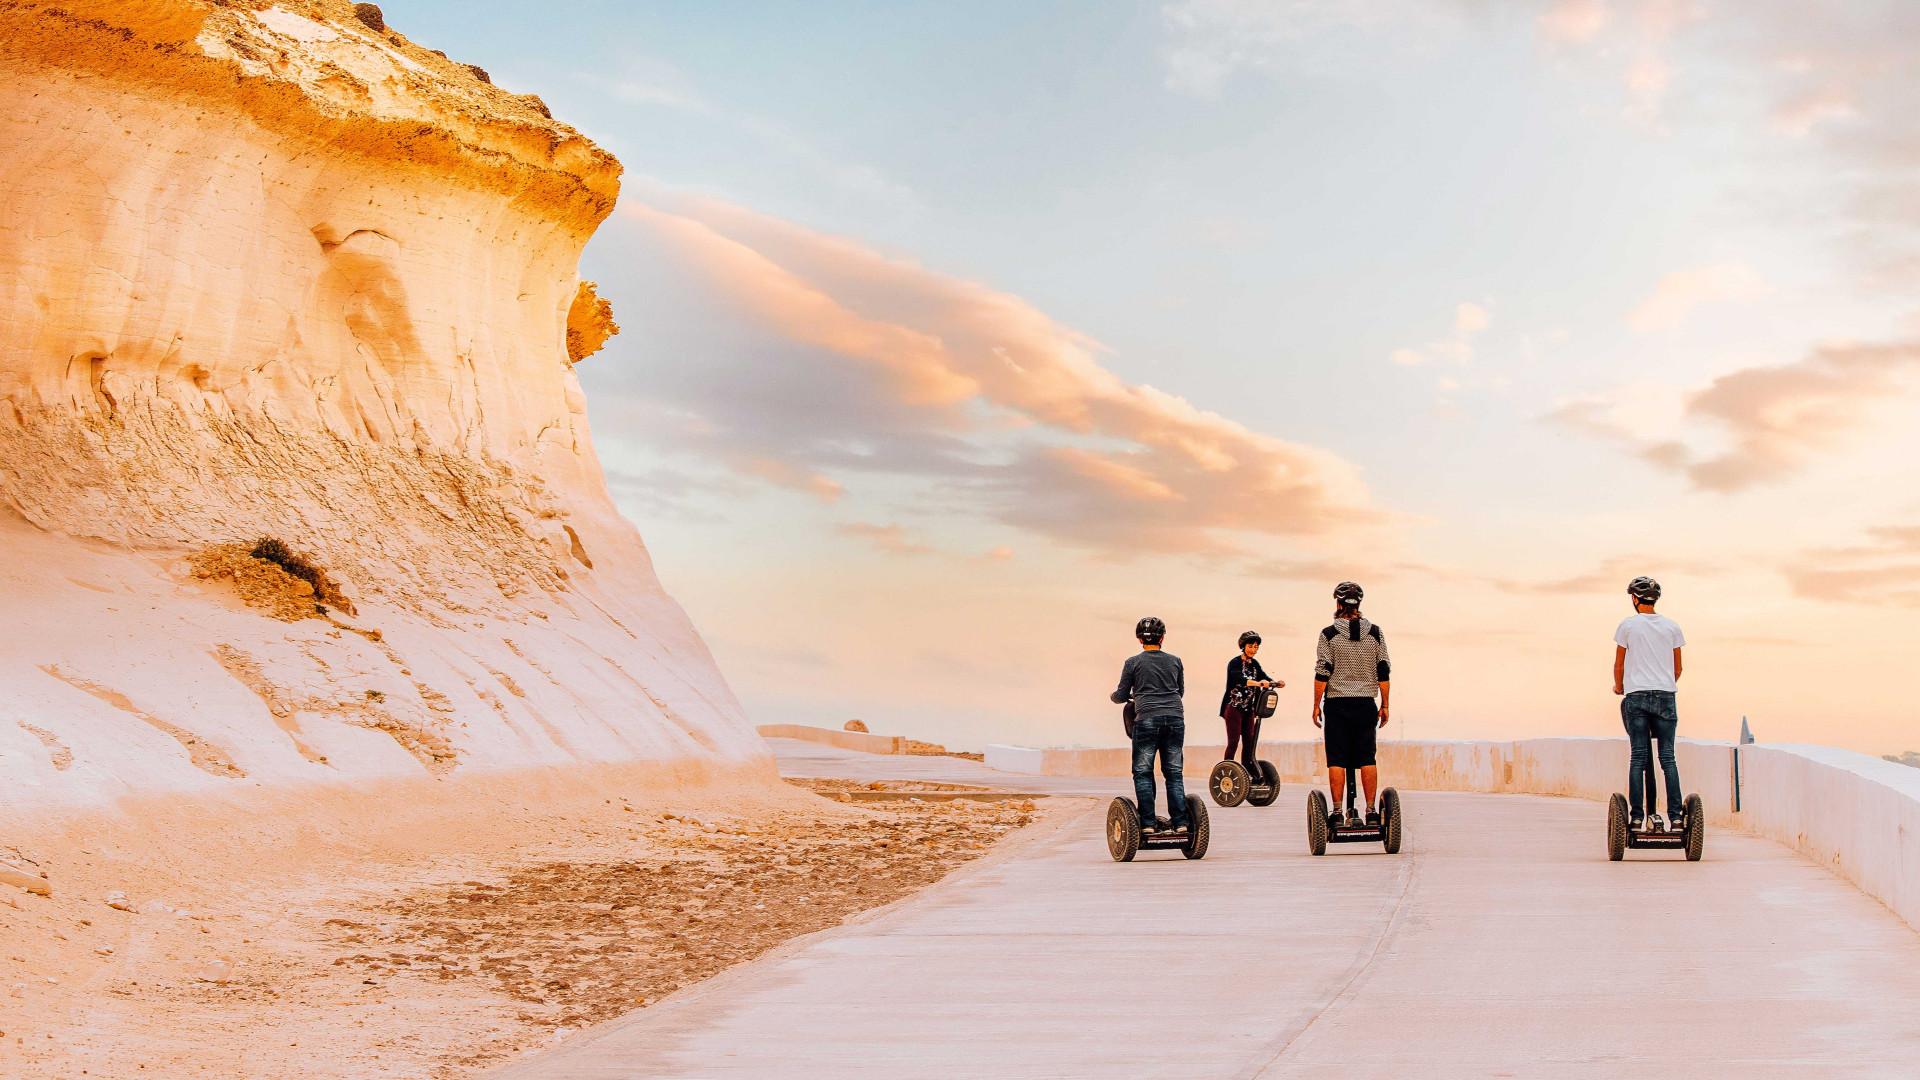 Segway touring in Gozo, Malta